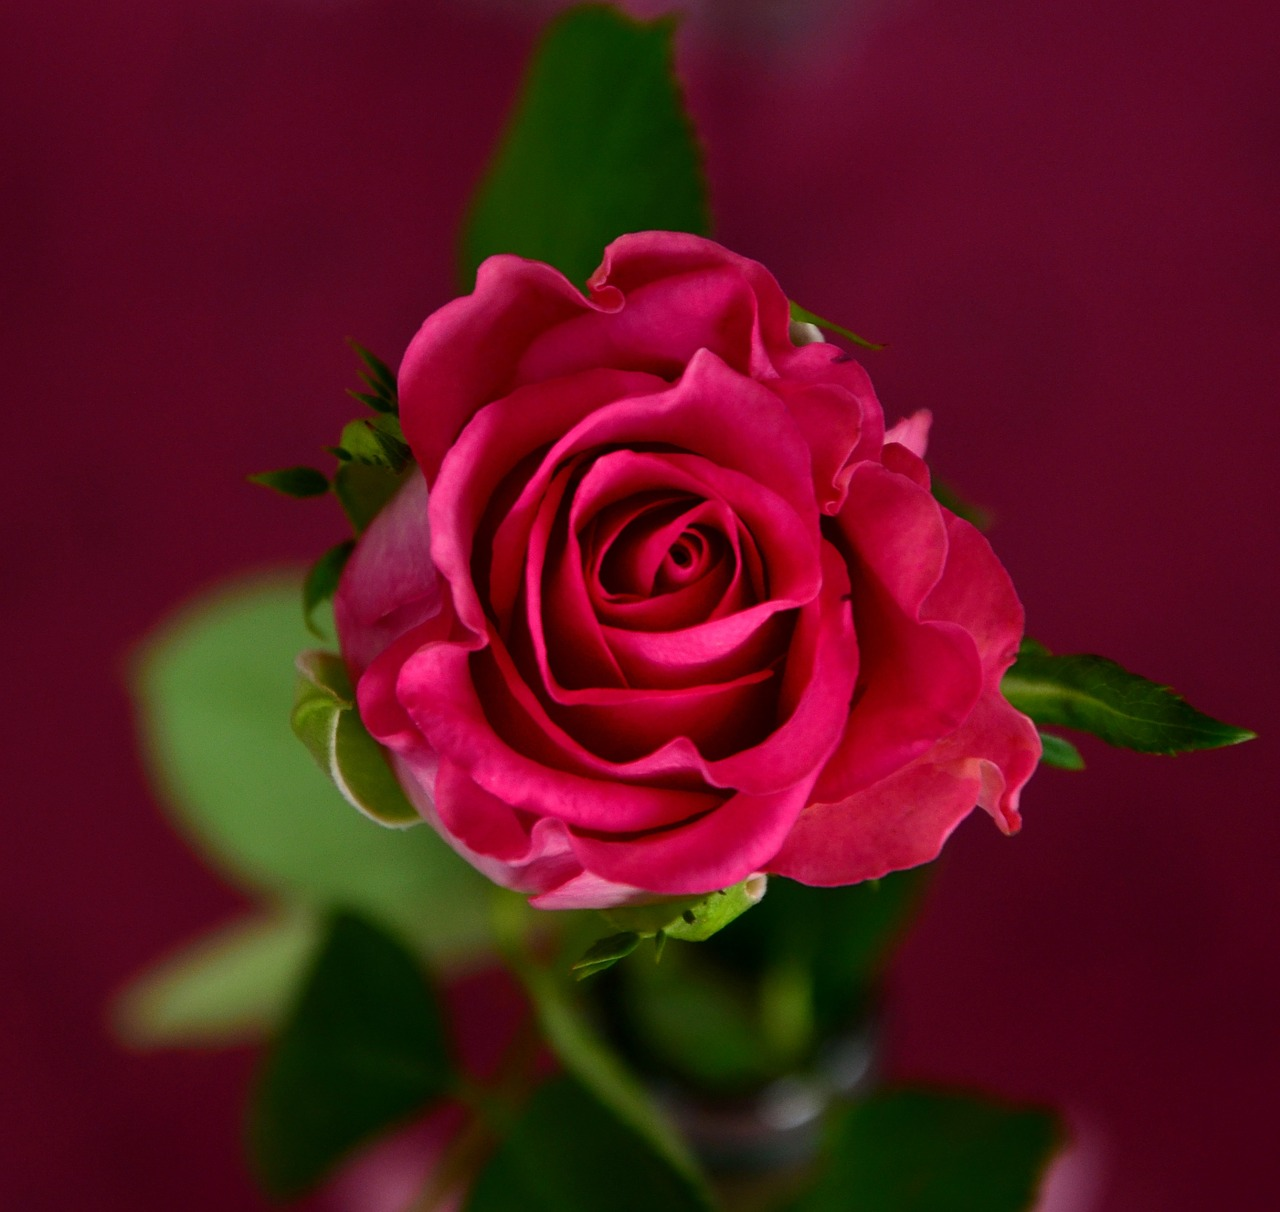 rose-693155_1280-1464015729.jpg